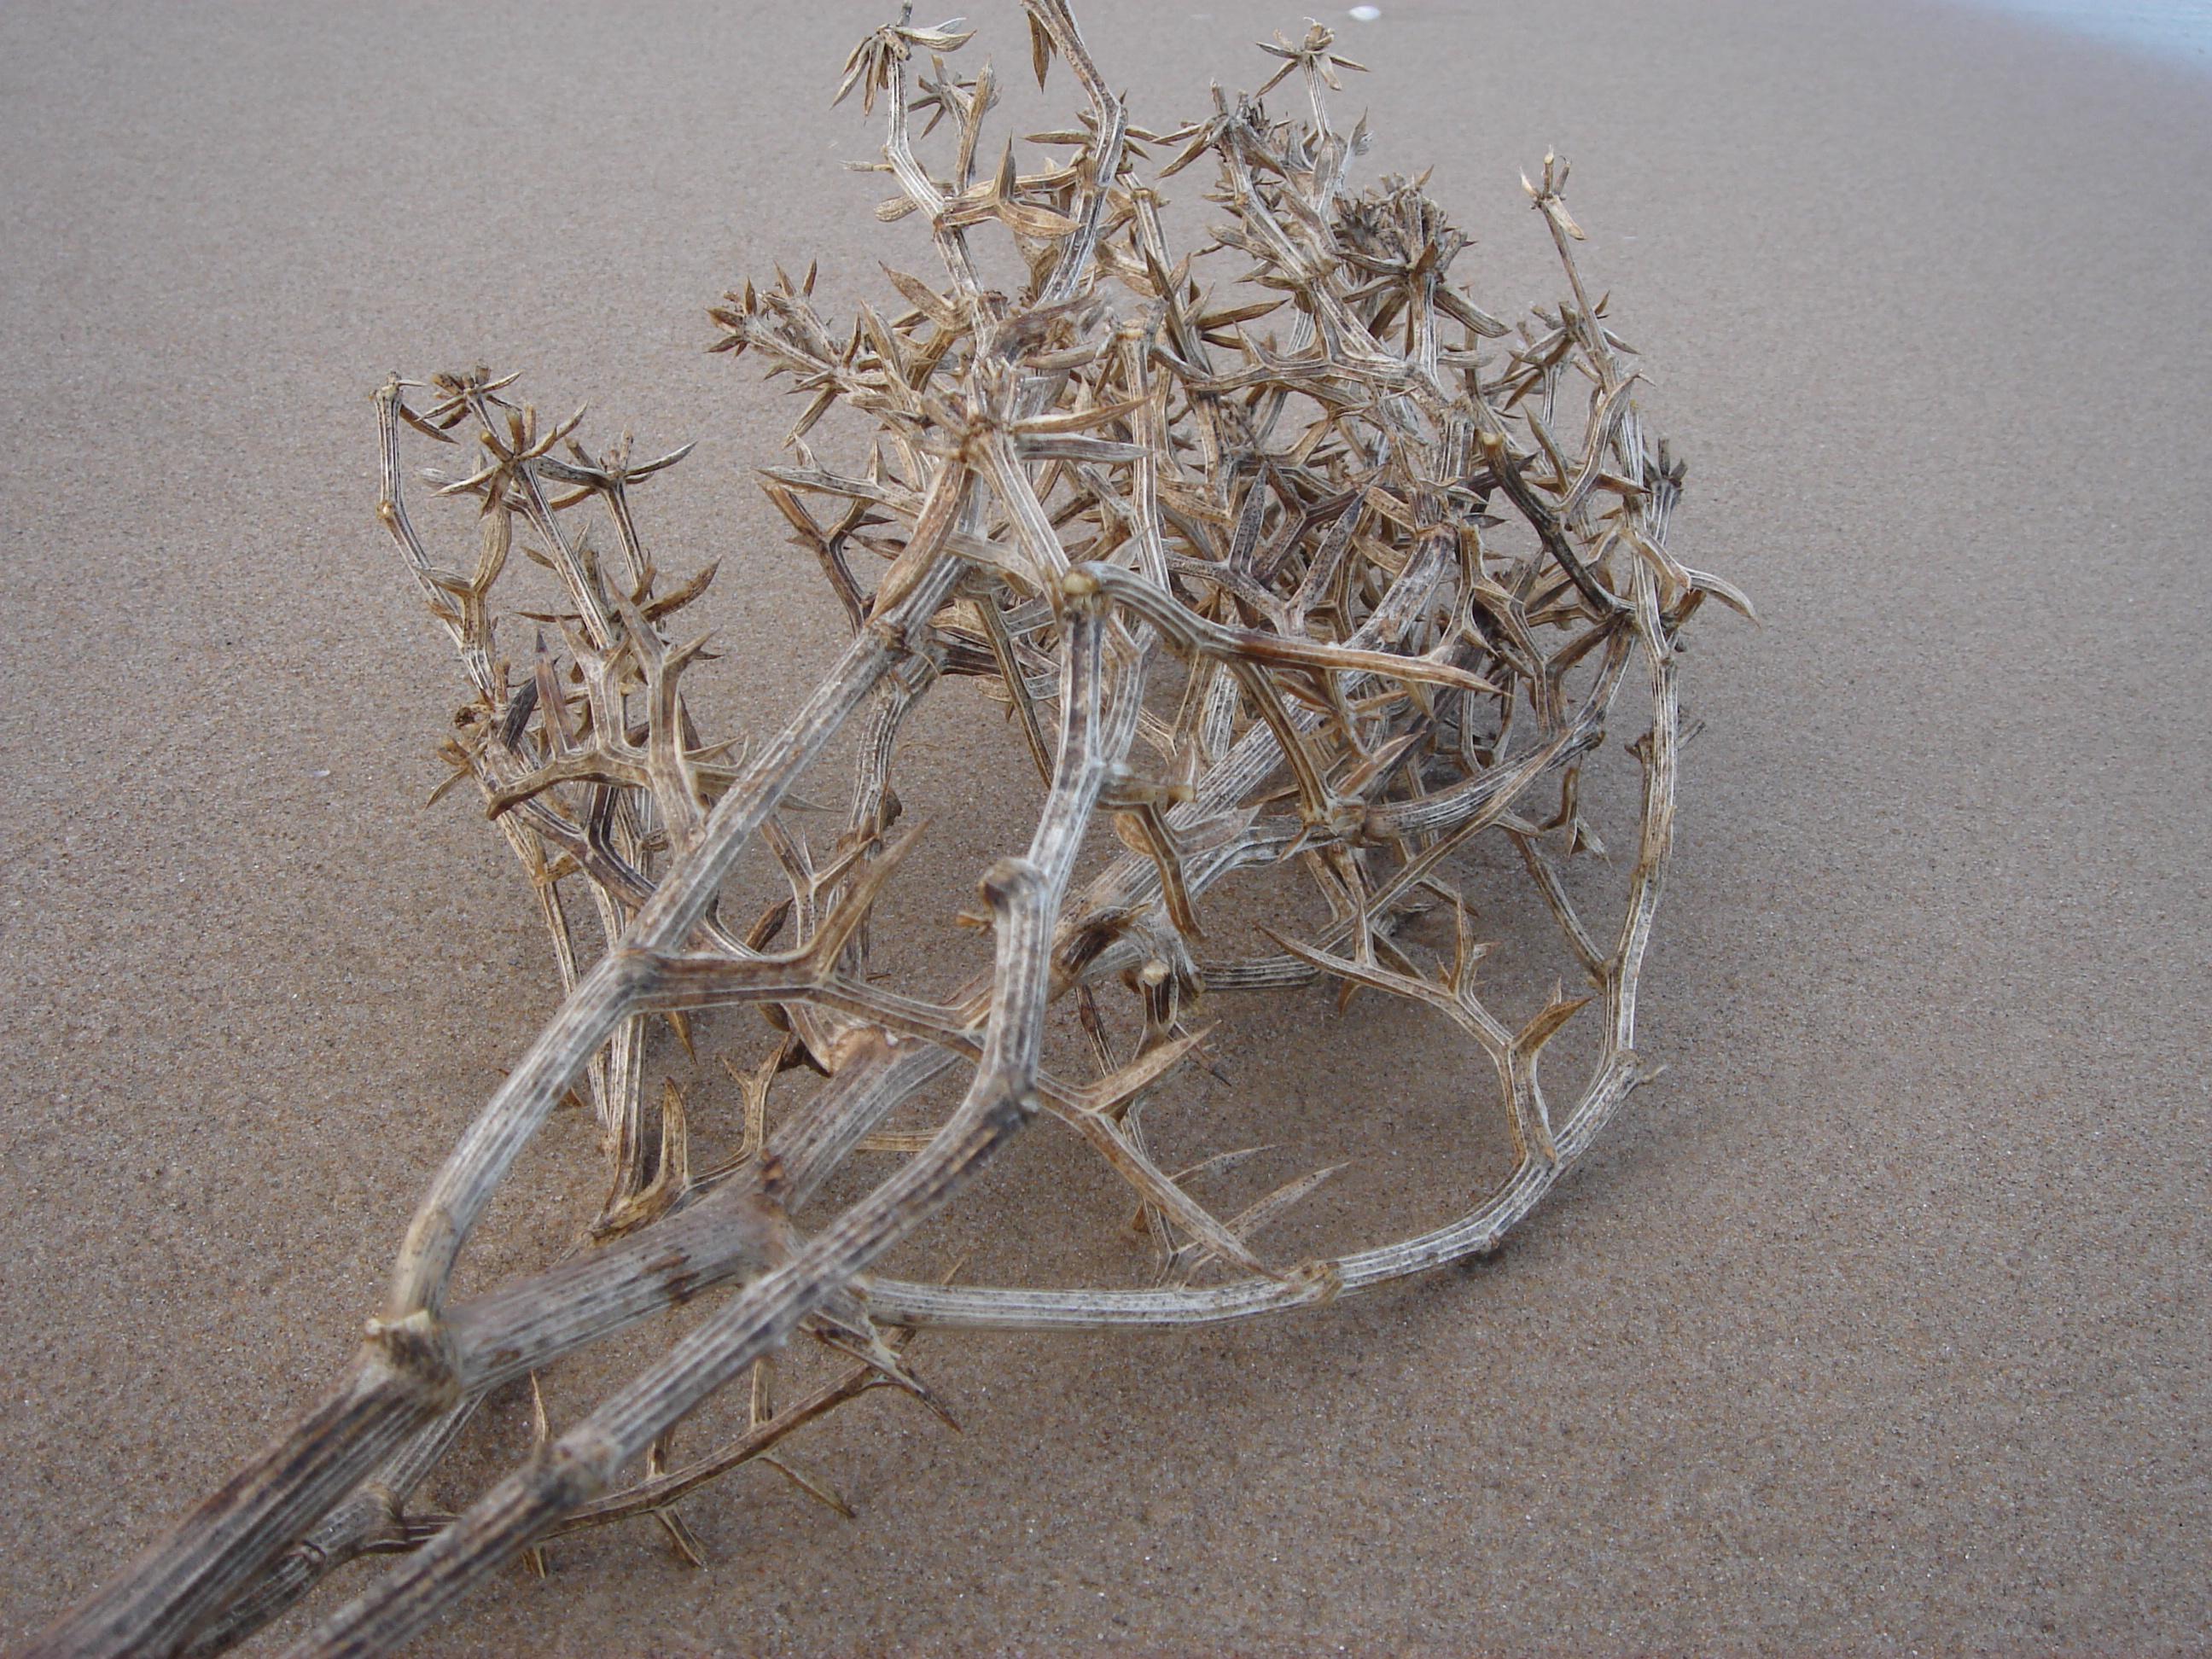 Foto playa Bega de Mar. [ n_lorito ]  Naturaleza muerta sobre la arena. Playa Mareny Blau. Sueca